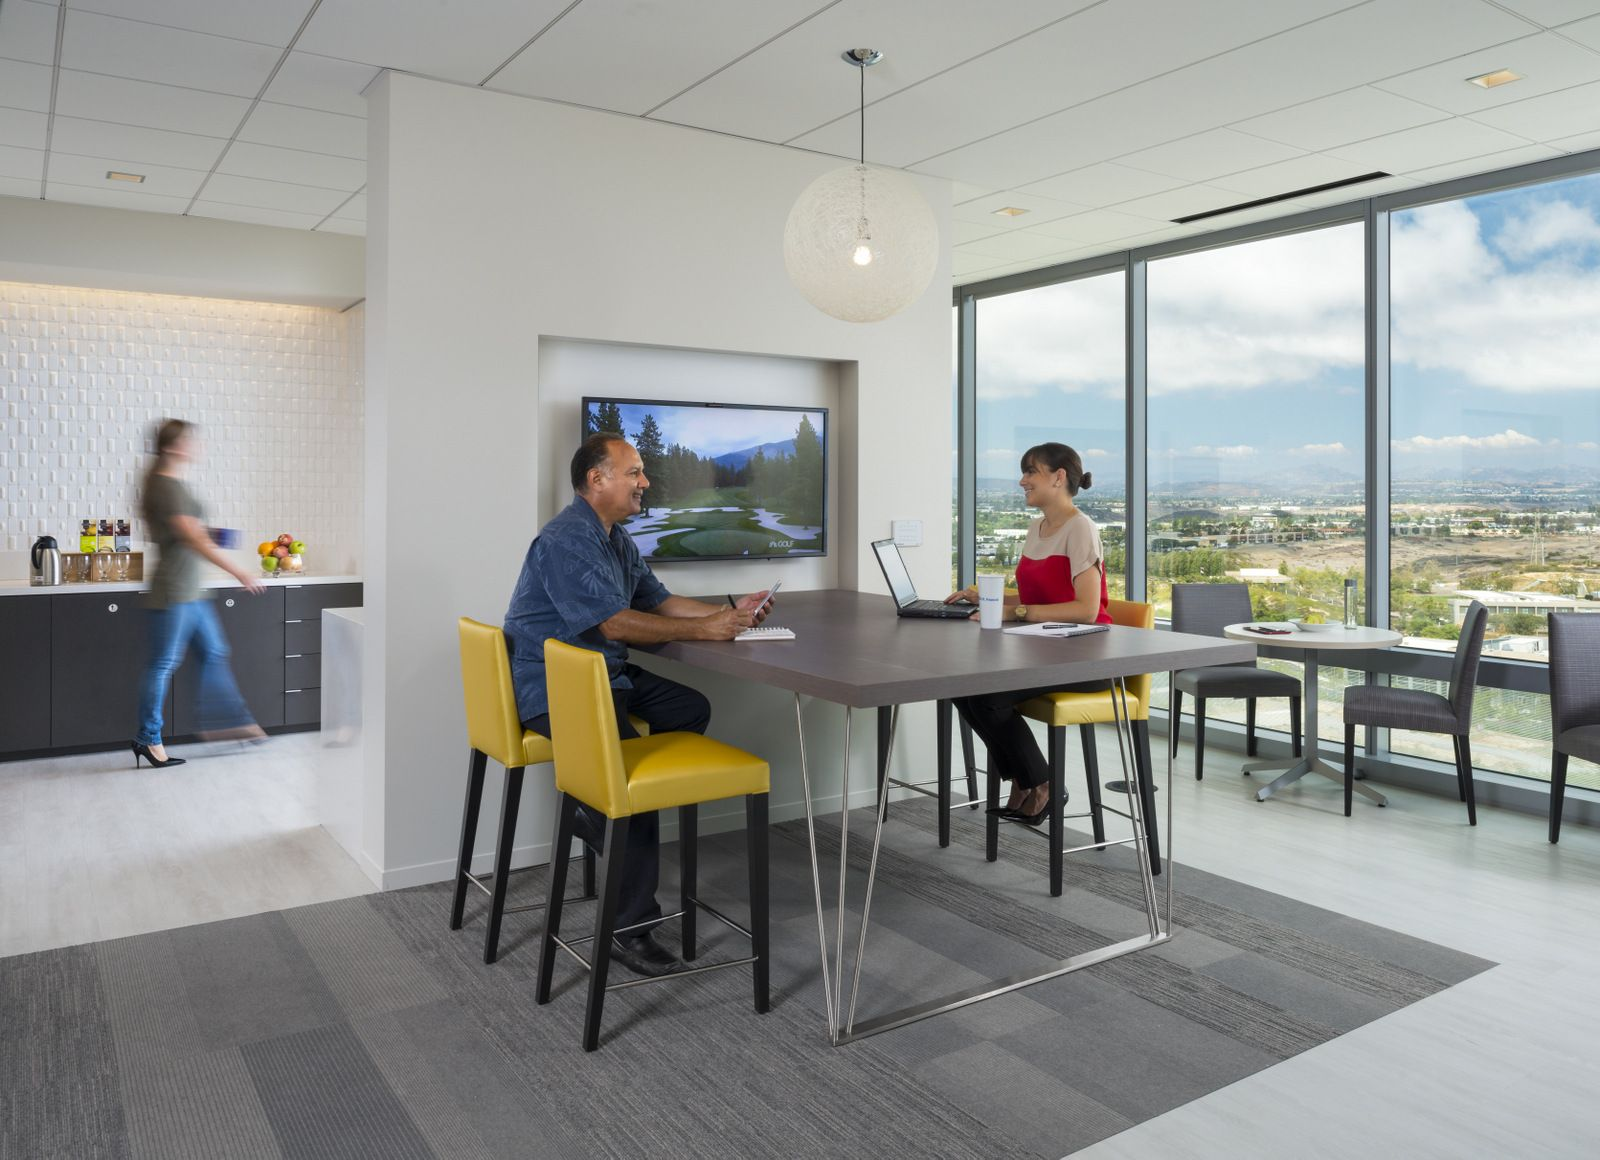 lpl financial san diego. LPL Financial - San Diego Offices By Gensler. Lpl